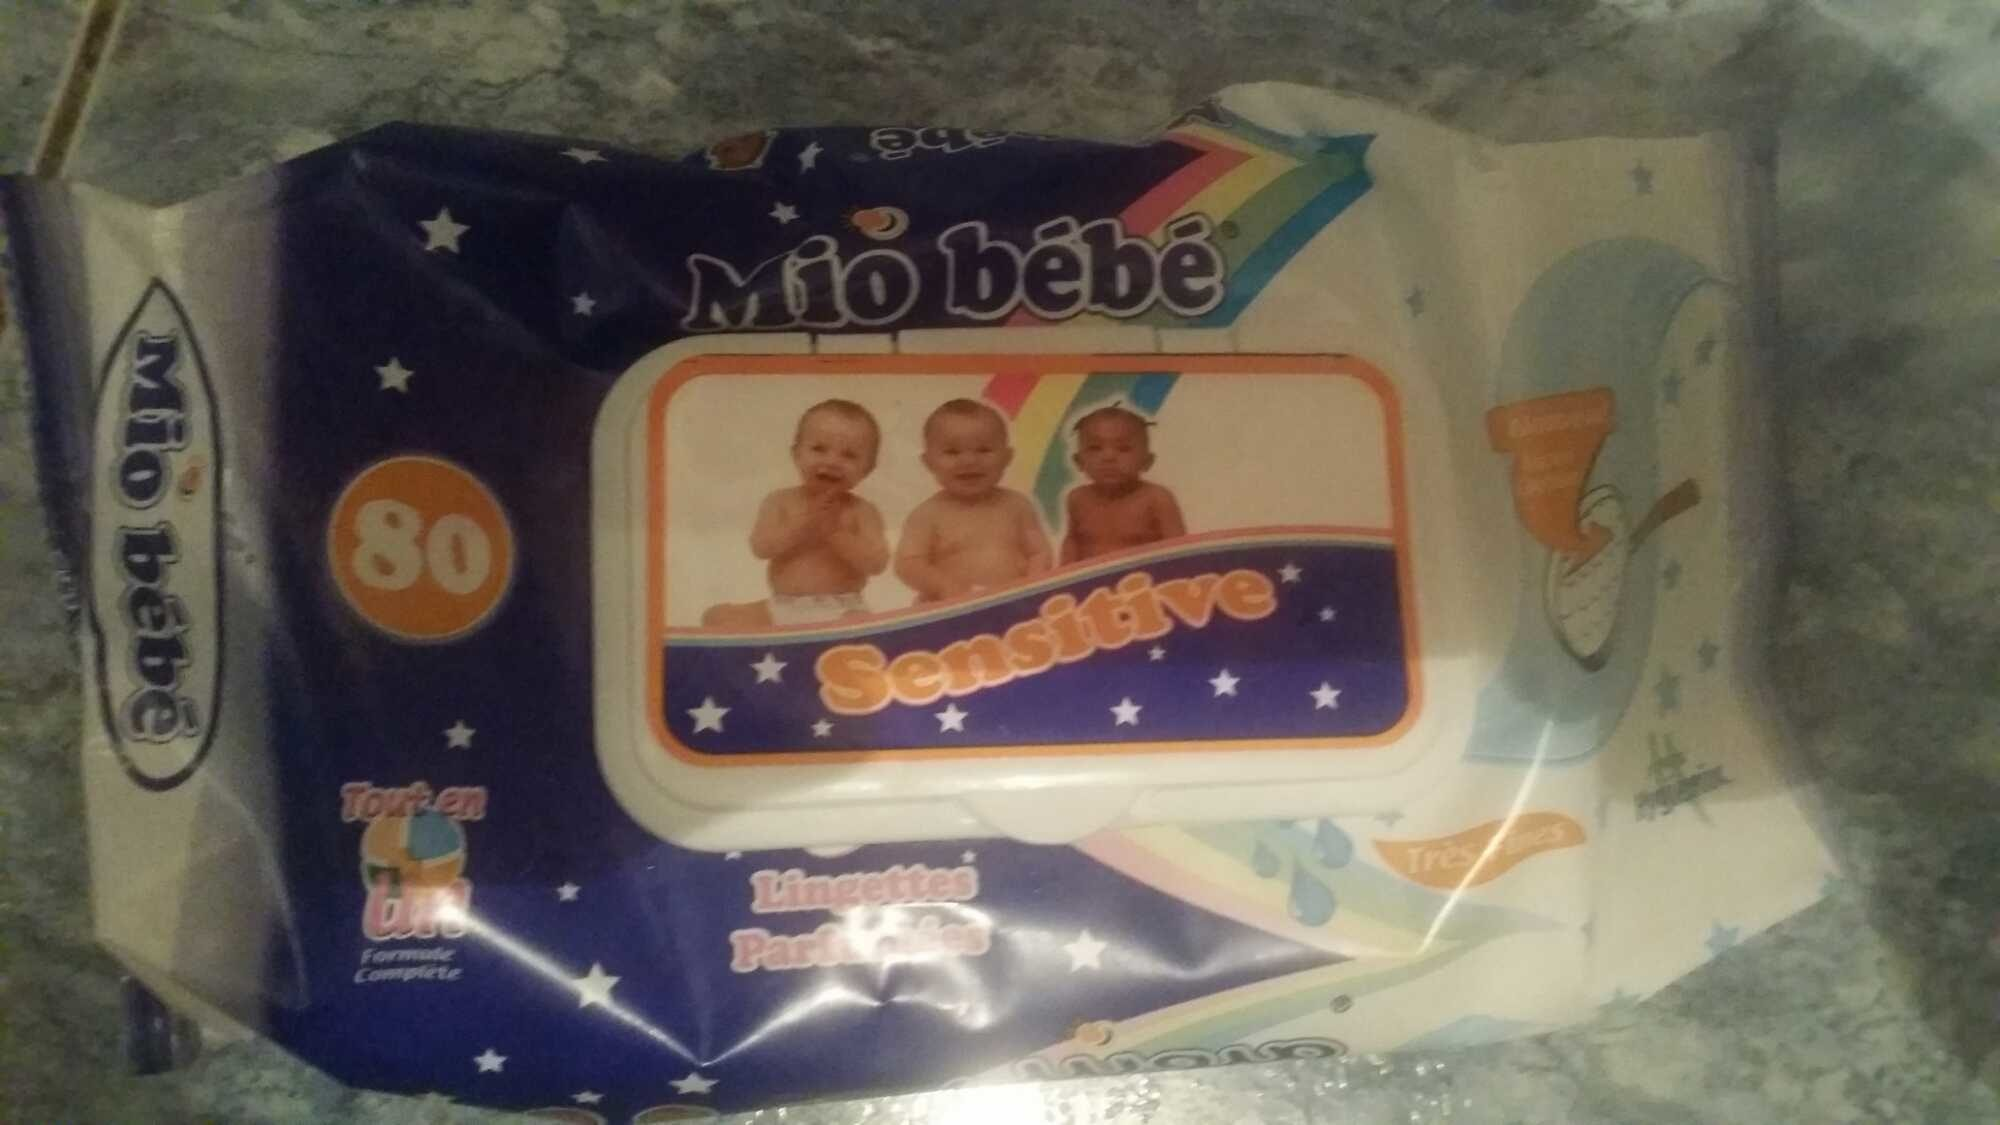 mio bebe - Product - fr